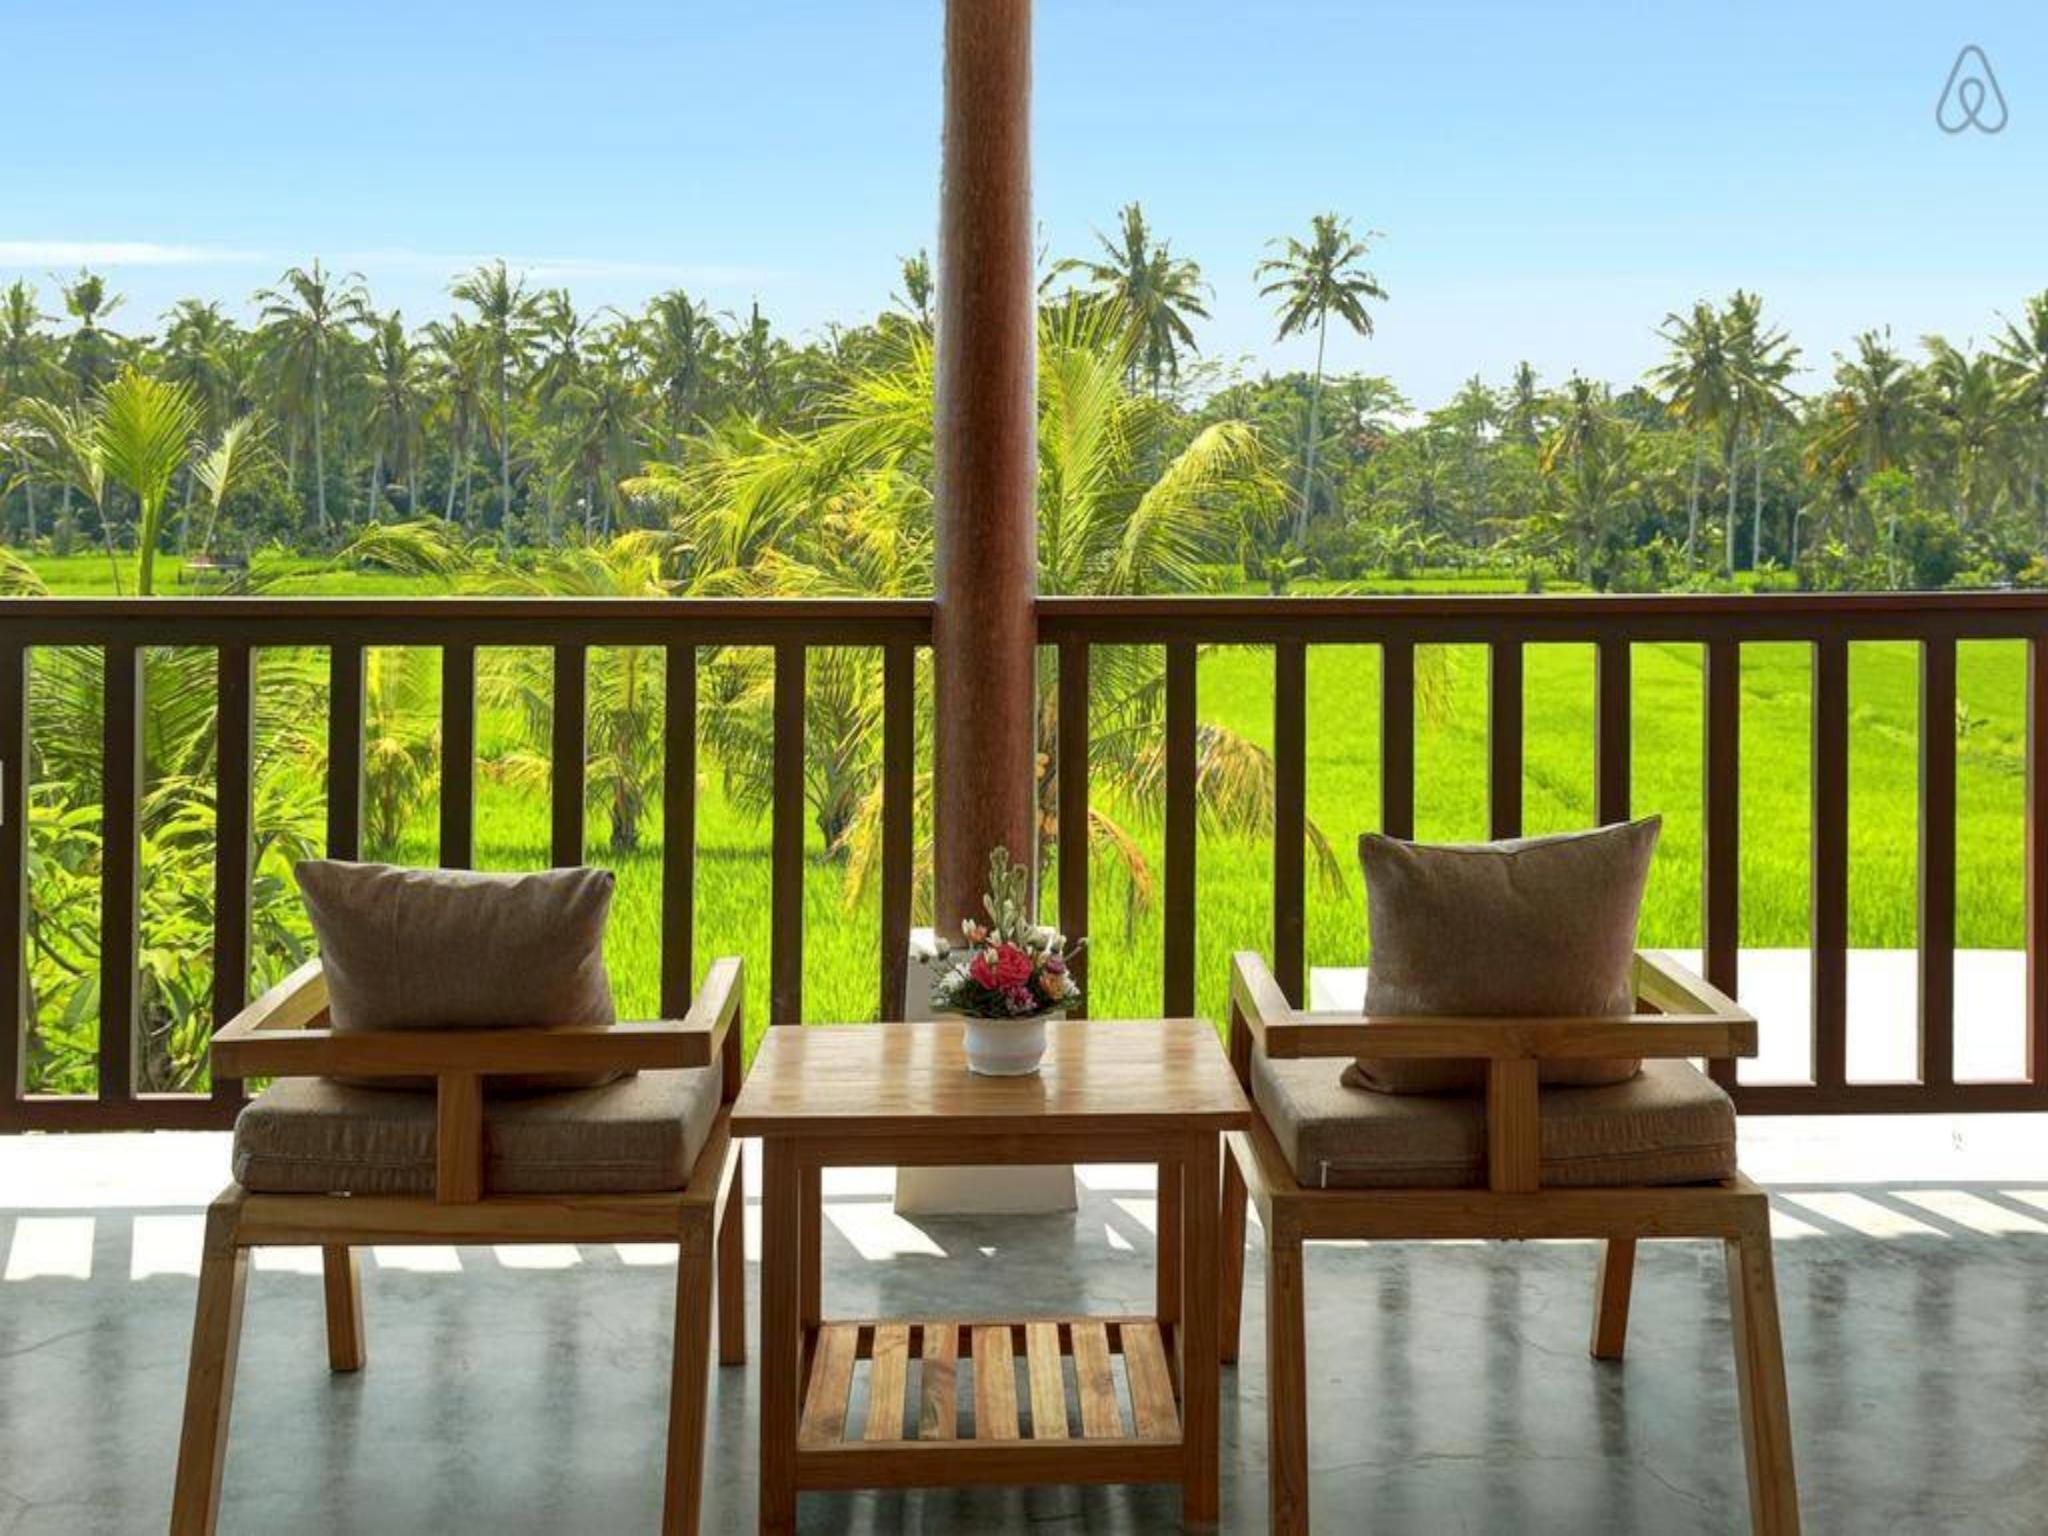 3 BDR Villas Sativa Suite at Ubud